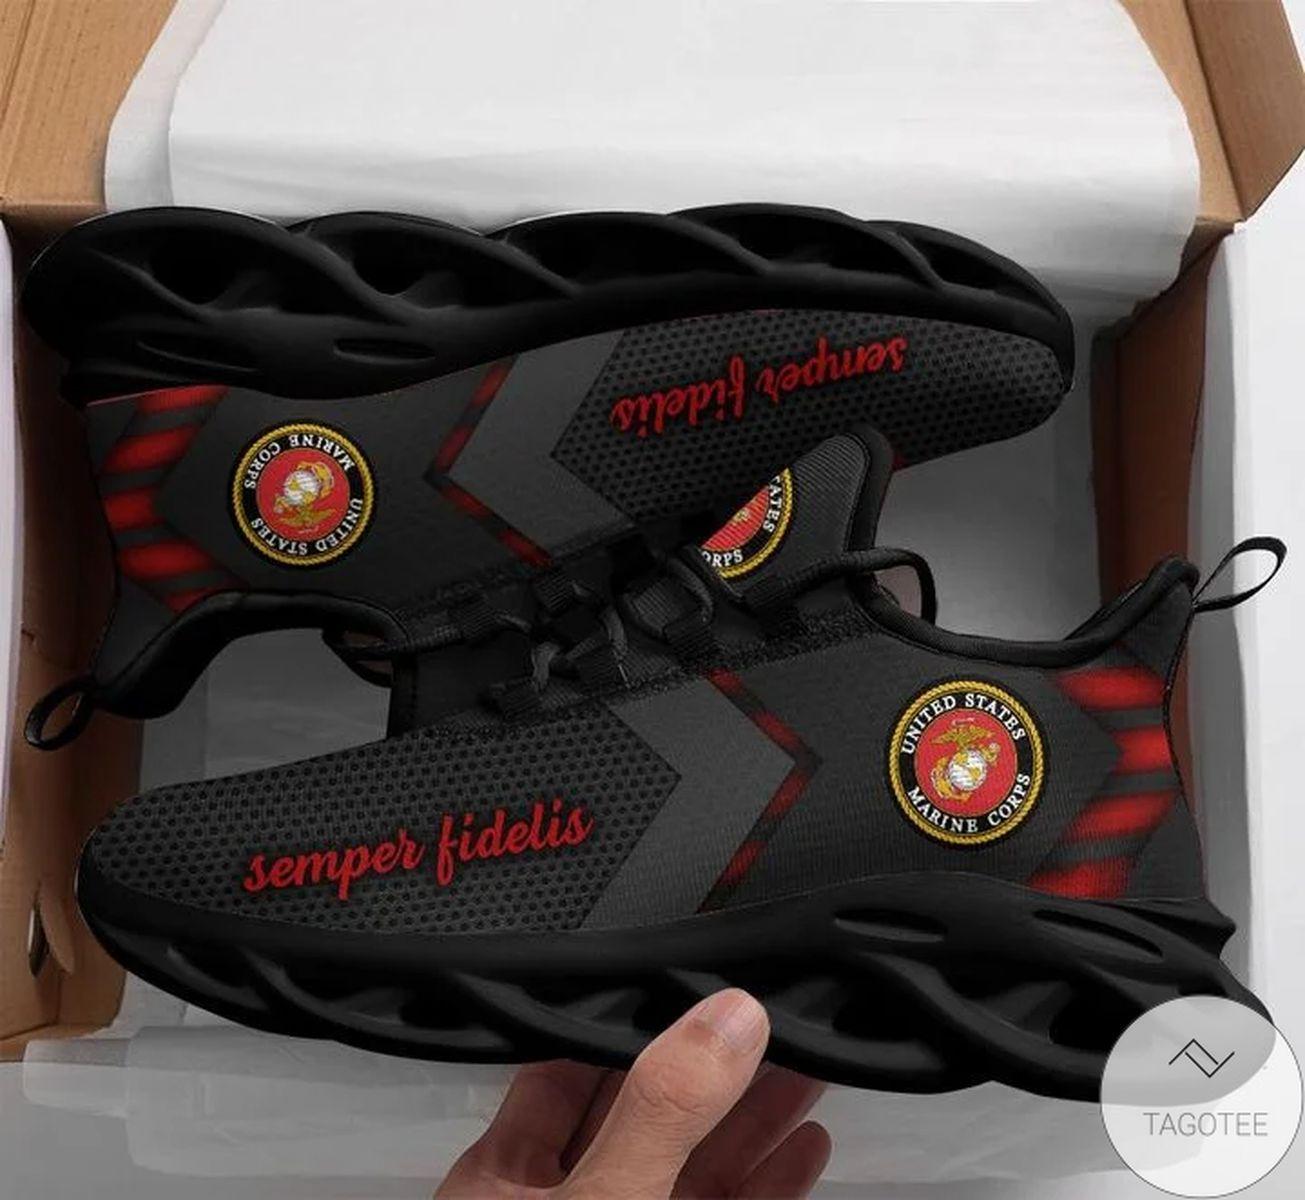 US Marine Semper Fidelis Sneaker Max Soul Shoes